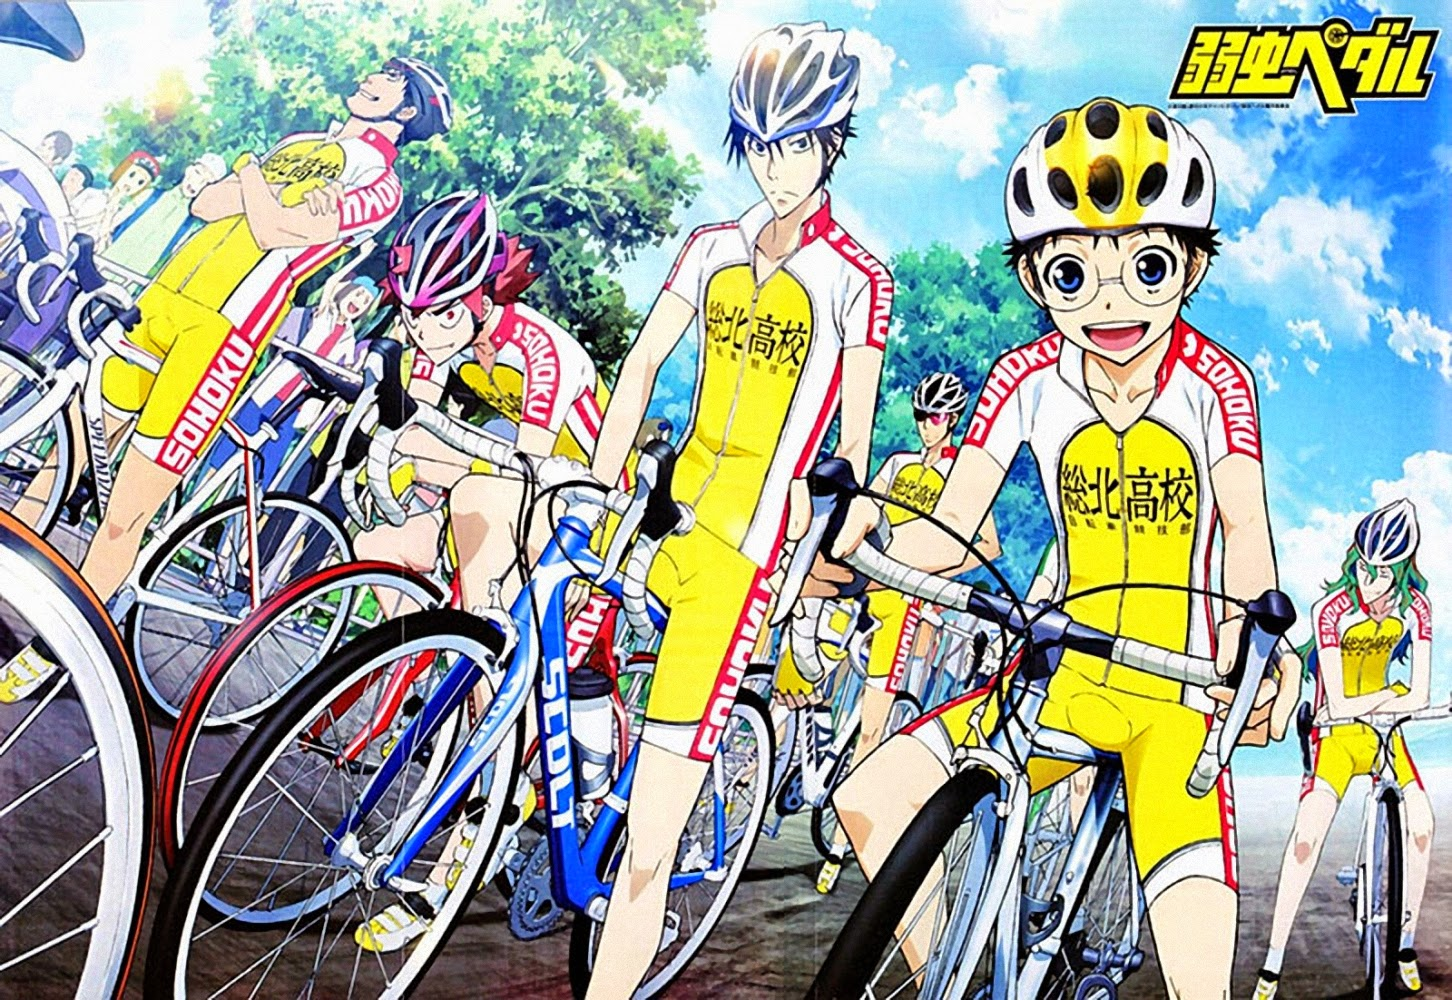 Download Yowamushi Pedal Subtitle Indonesia (Complete)